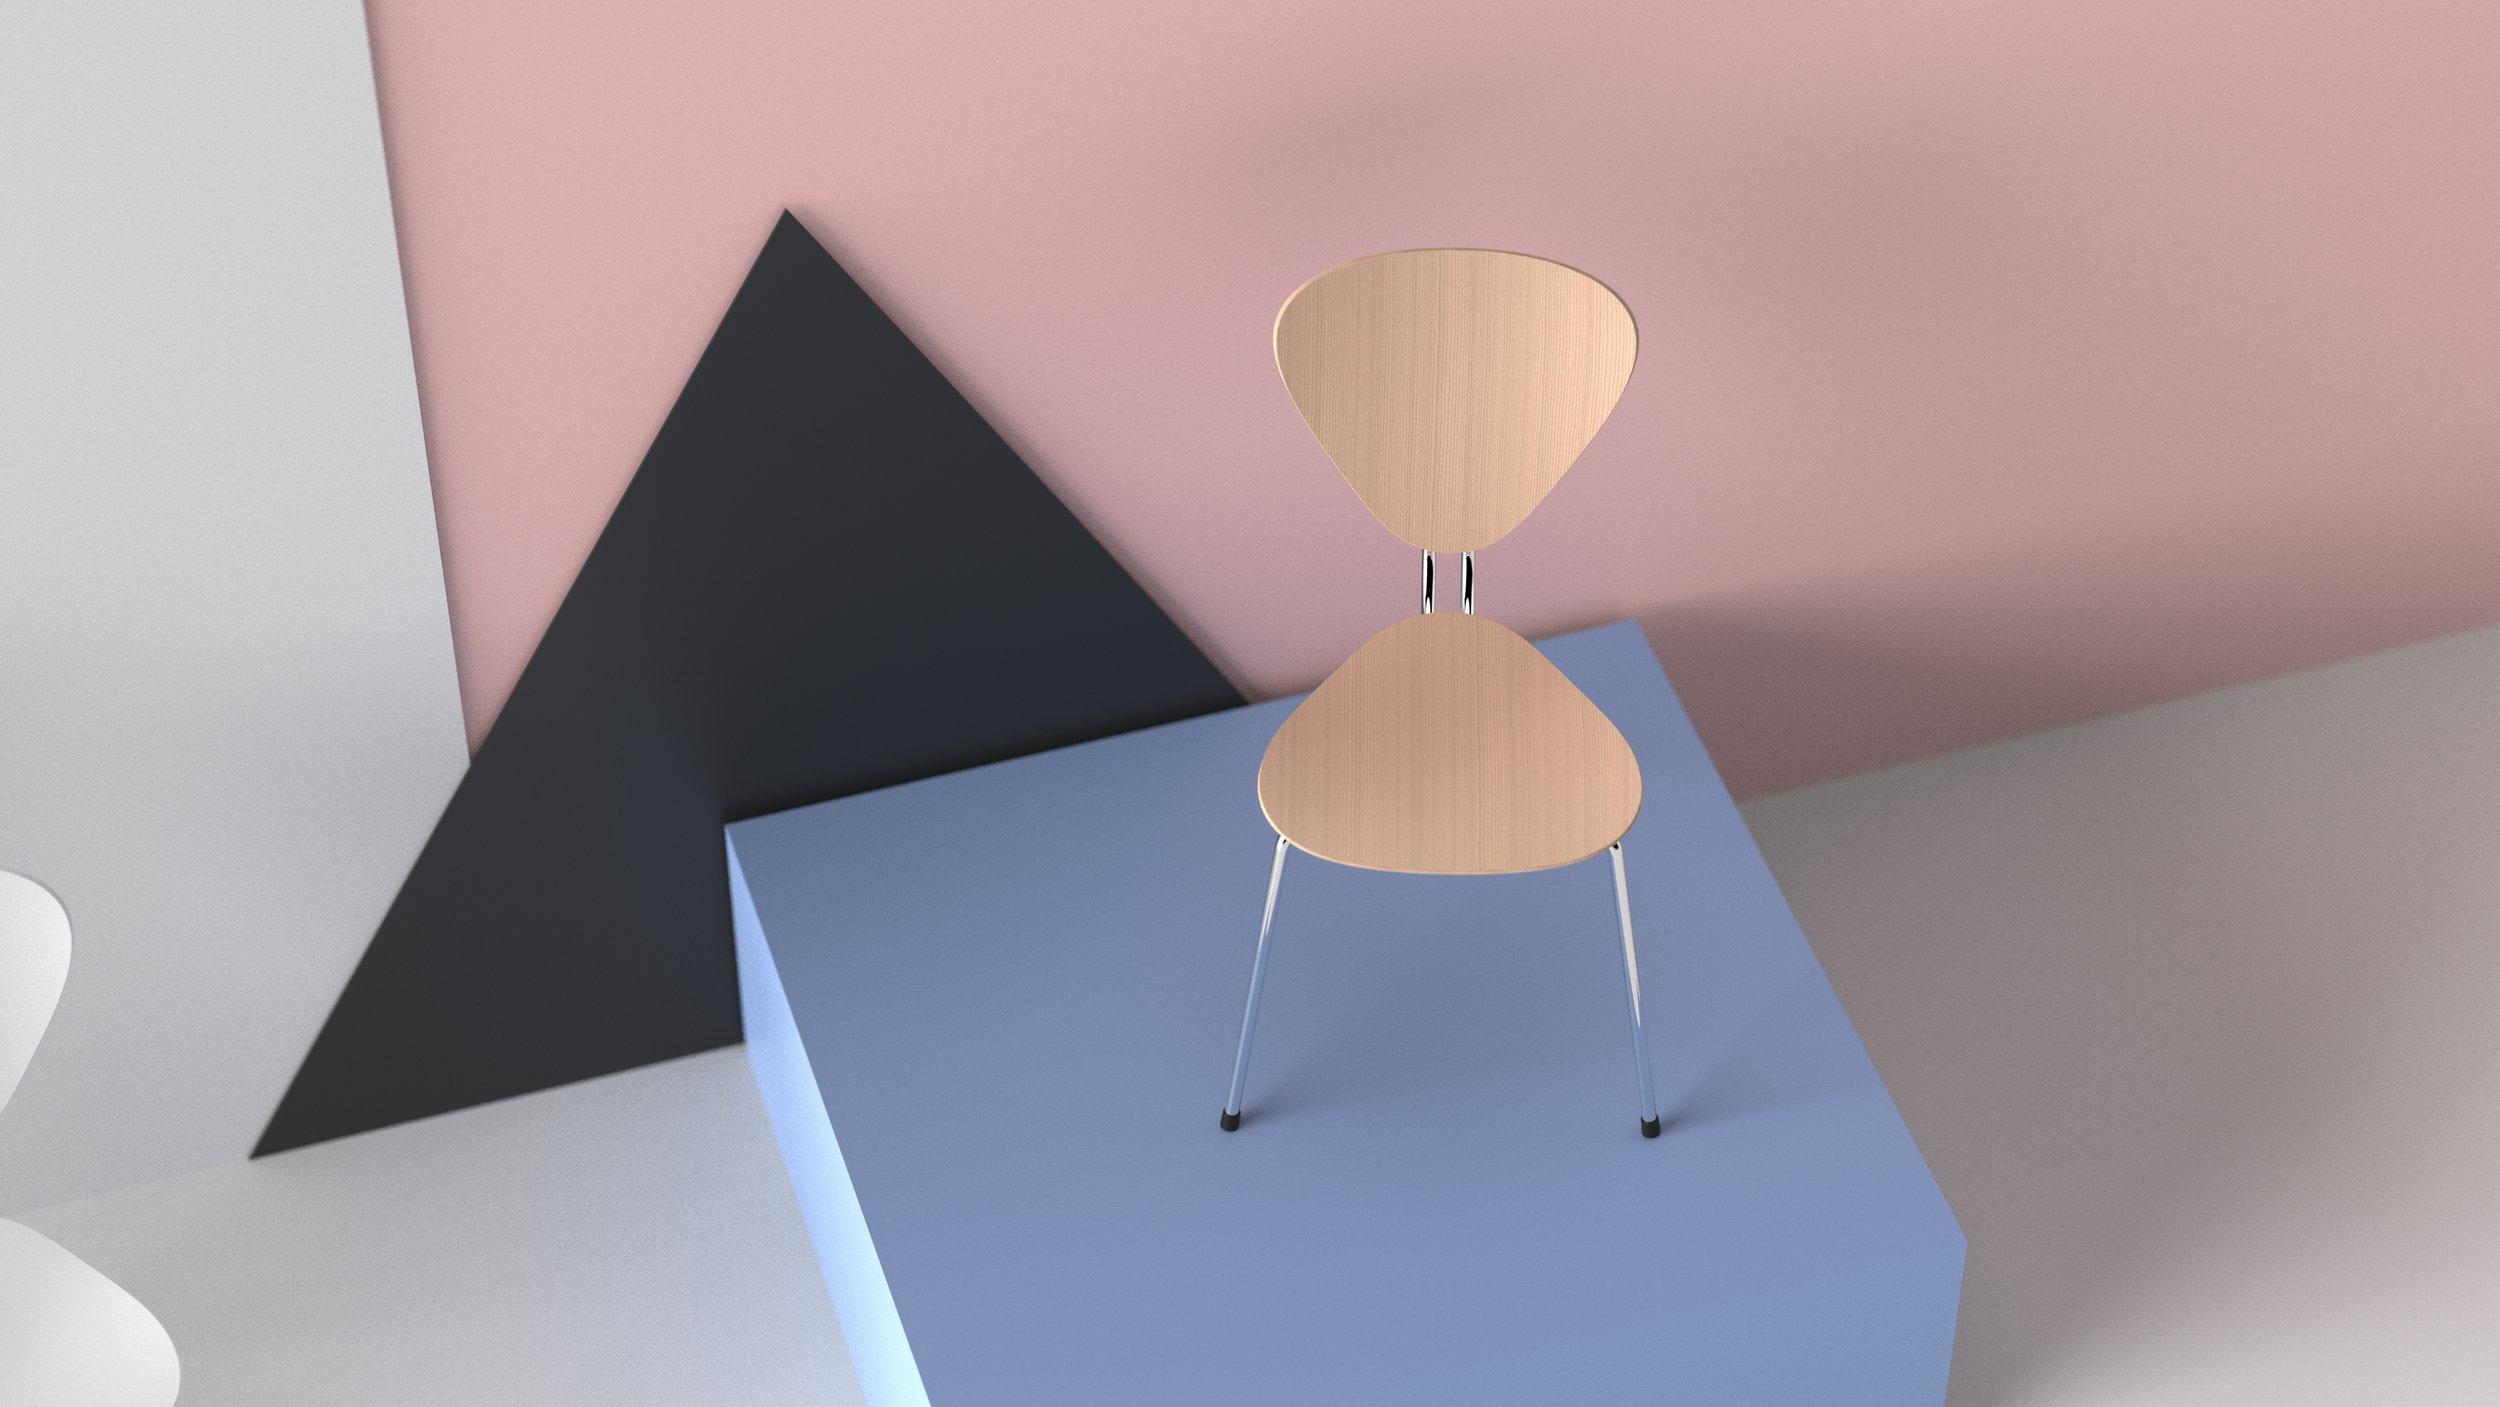 chair concha fondo dos.90fi.92.jpg